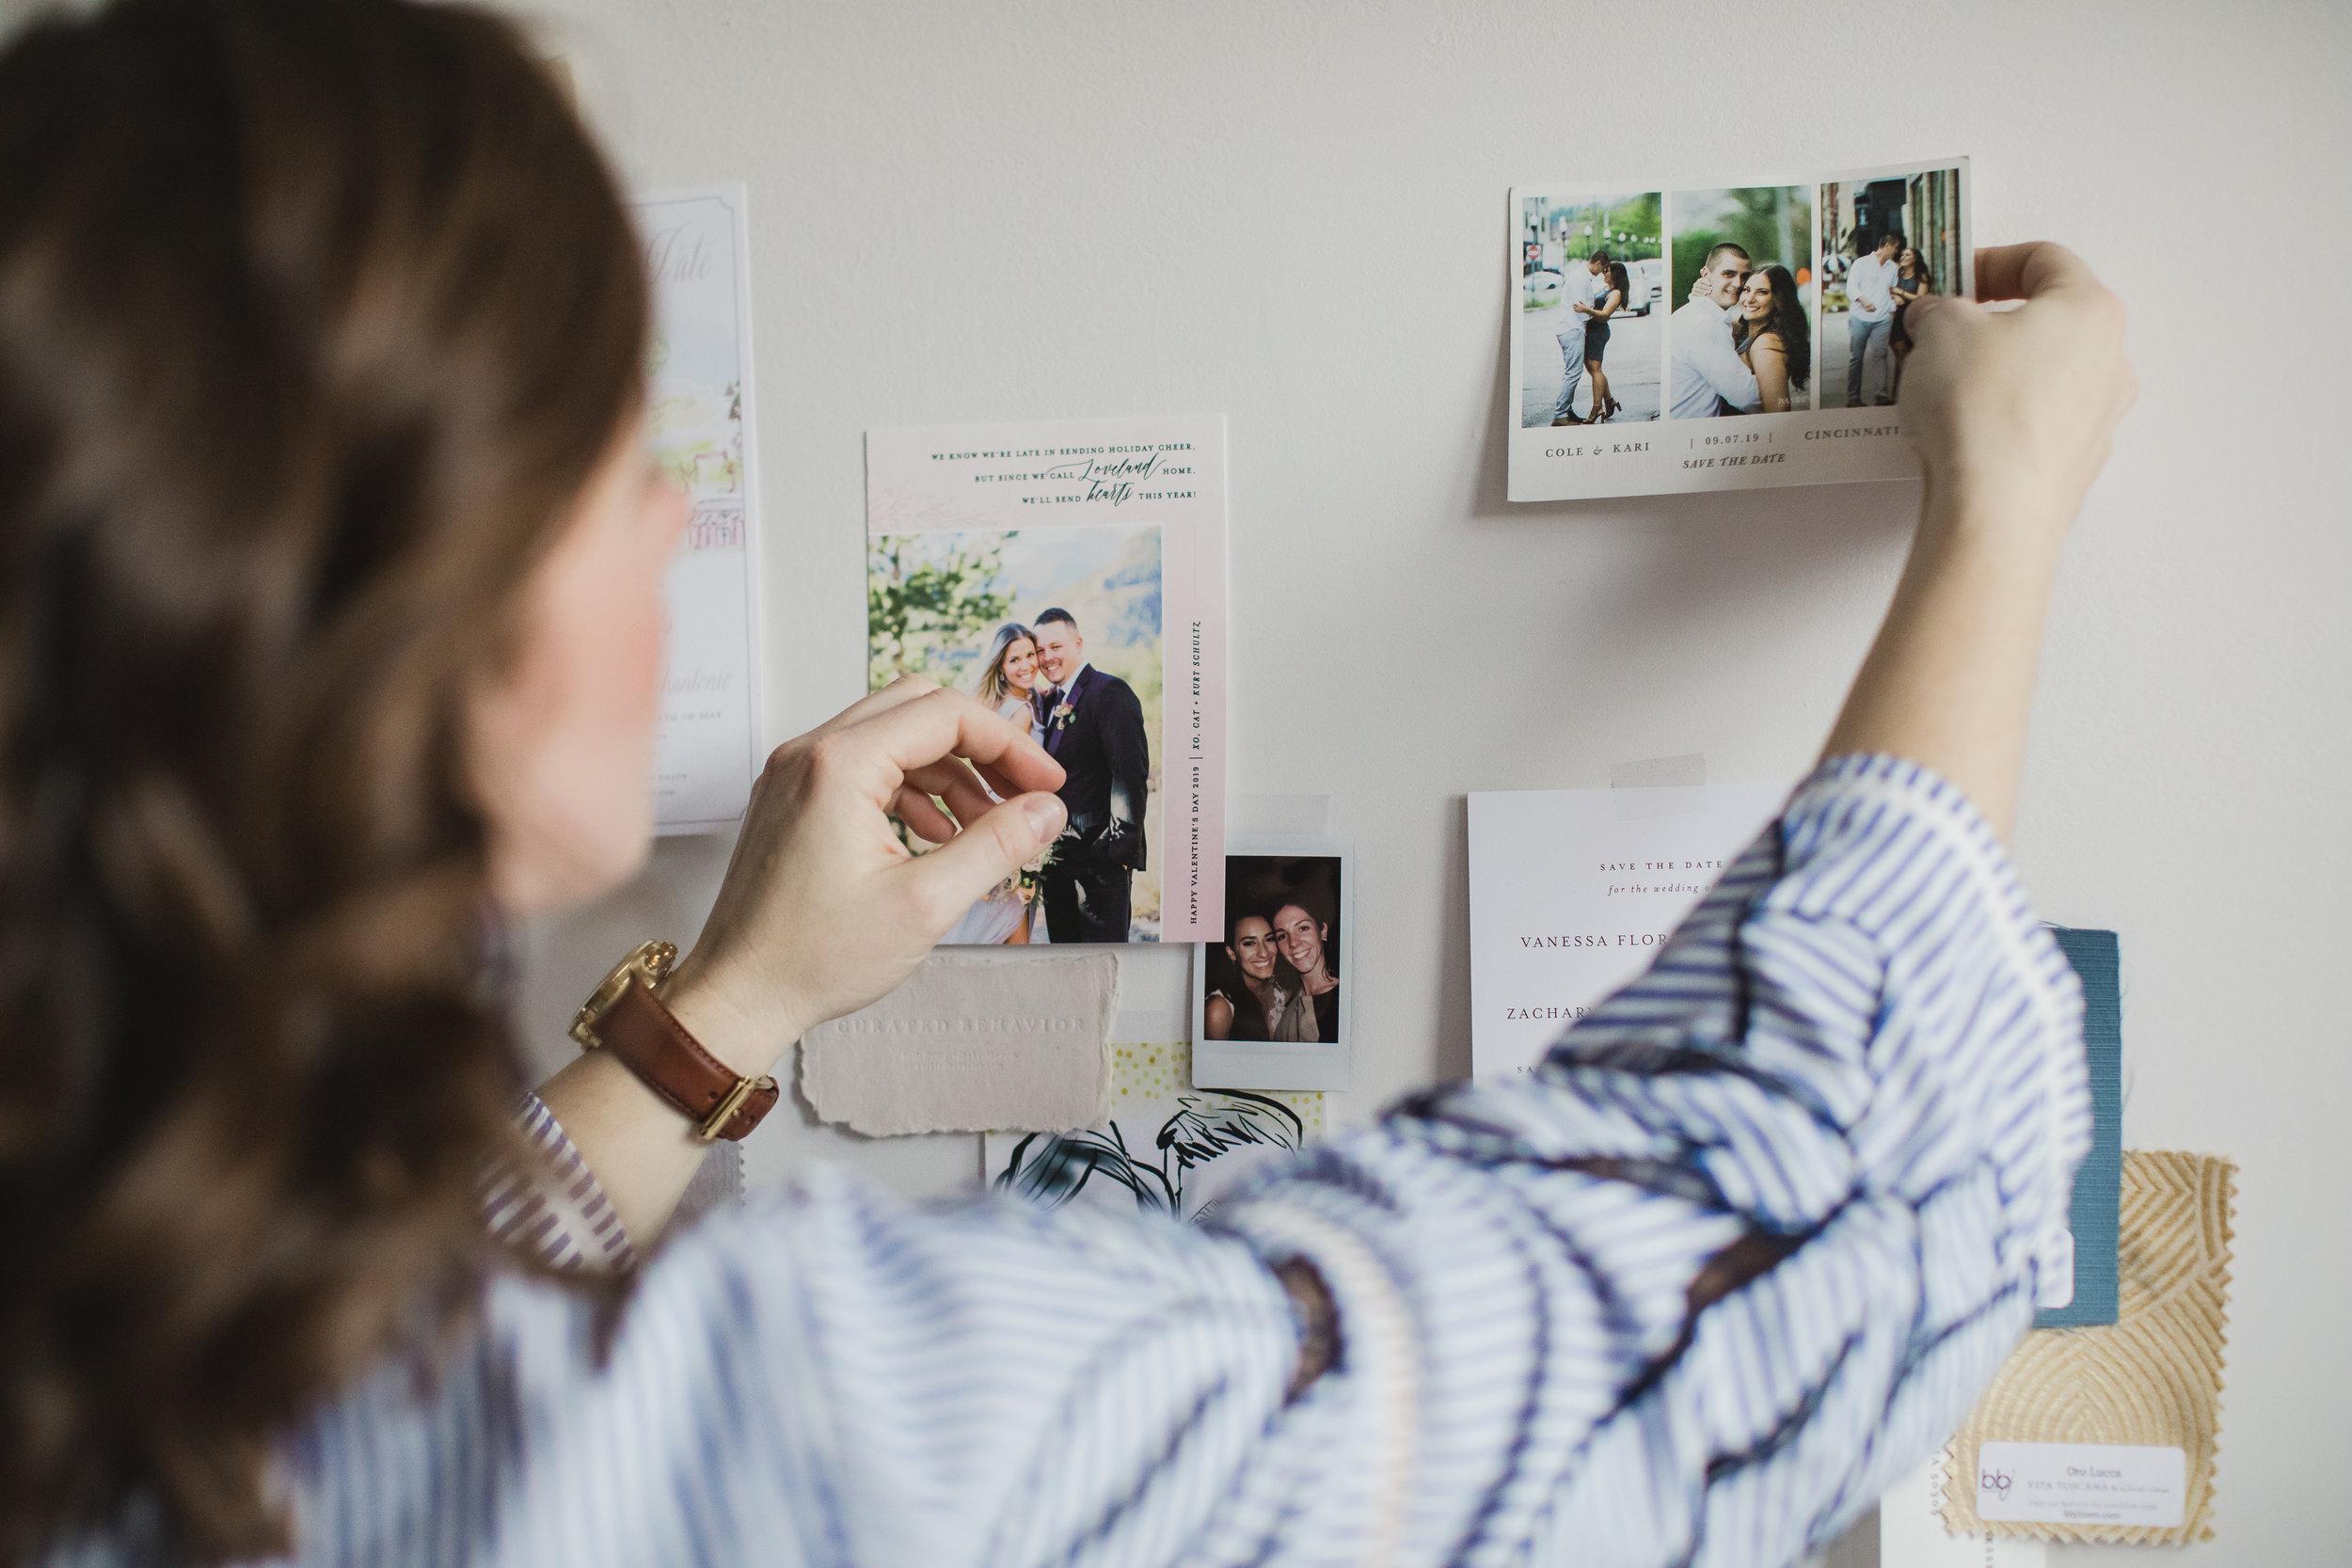 Samantha-Joy-Events-office-designer-collage-wall-dayton-ohio